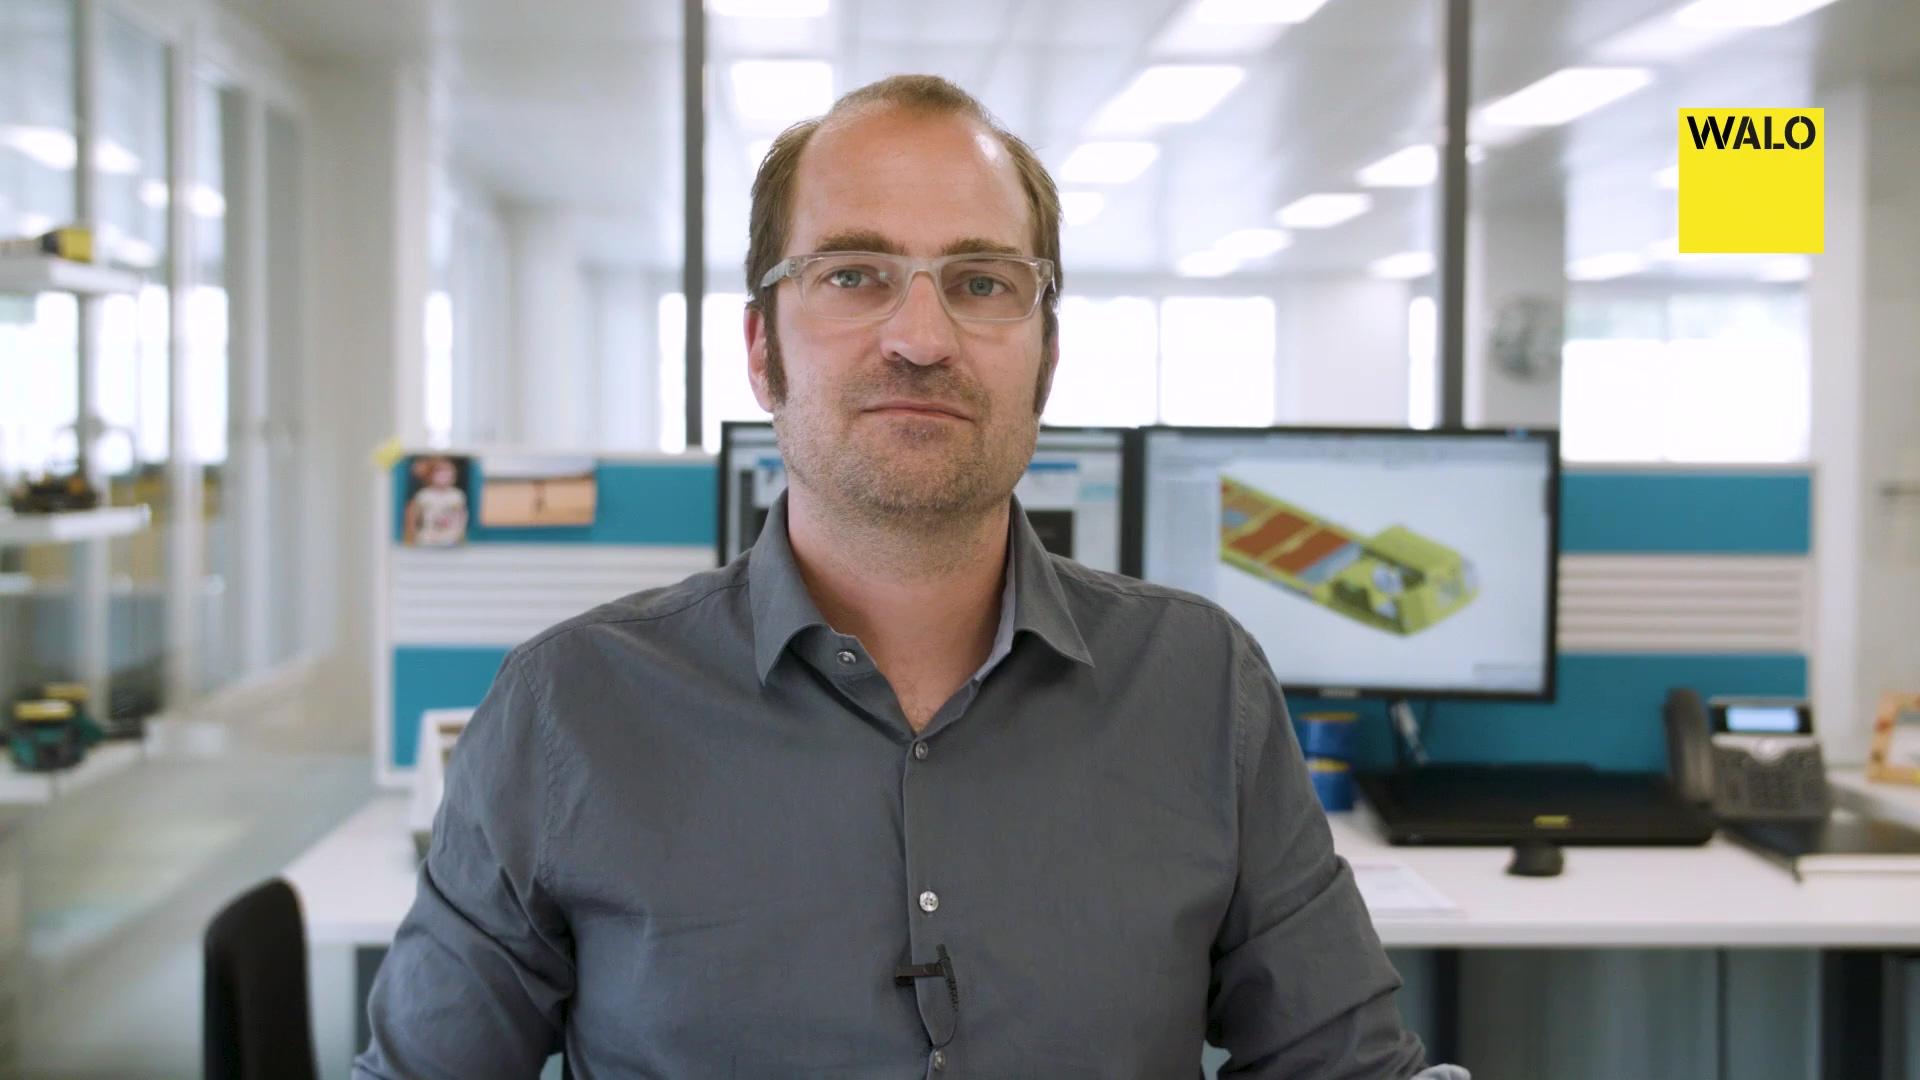 WALO_Employer Branding_Bernhard Zingg